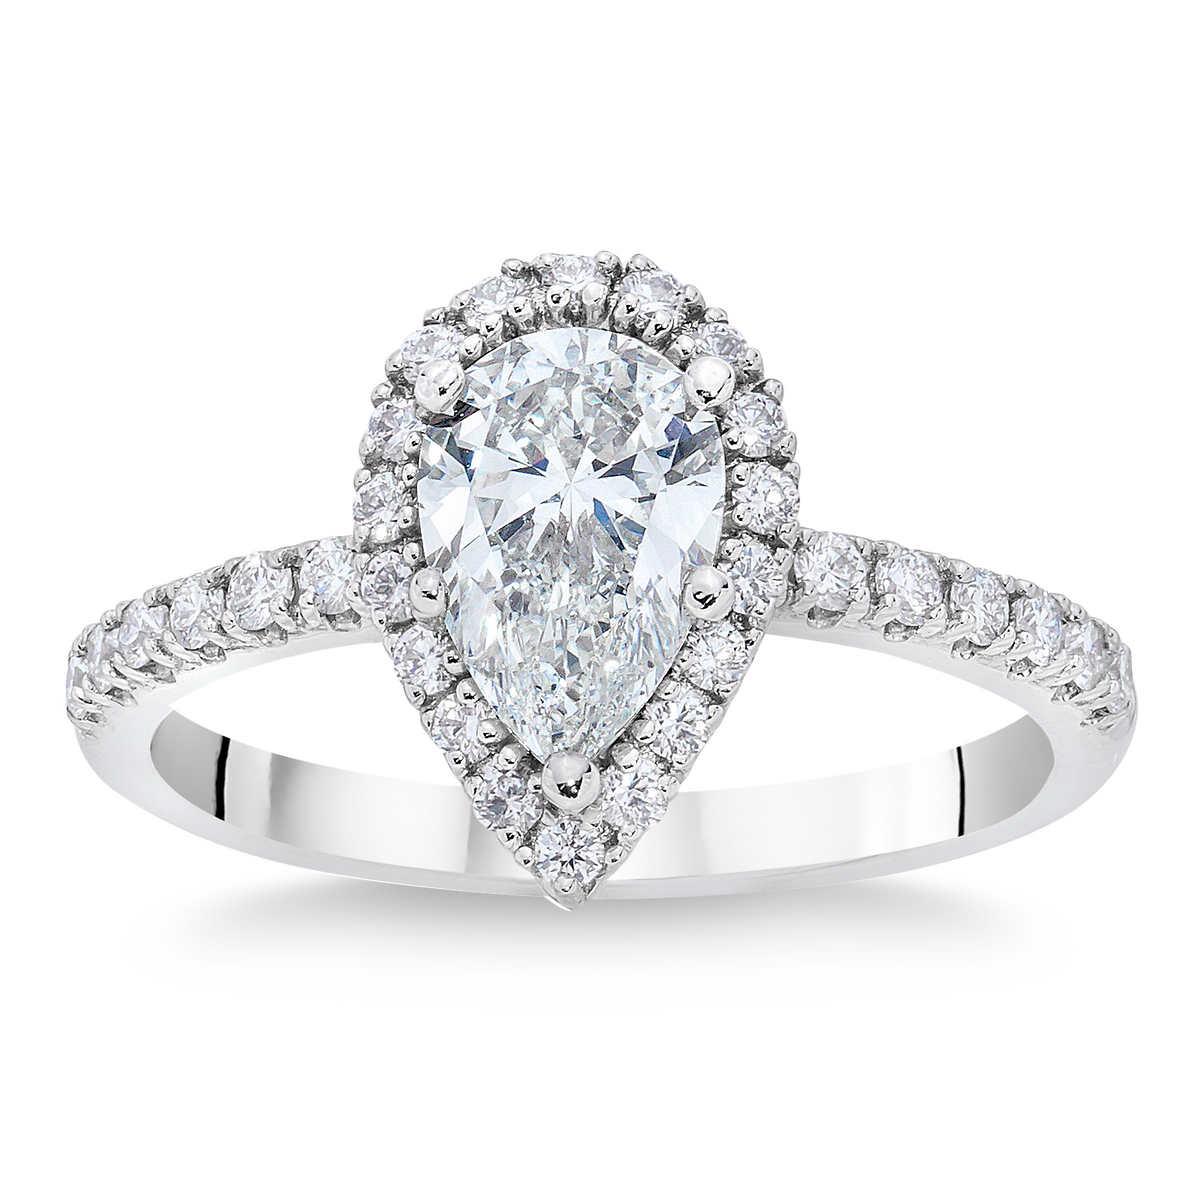 engagement wedding ring Pear Shape 2 52 ctw VS1 Clarity F Color Diamond Platinum Halo Ring